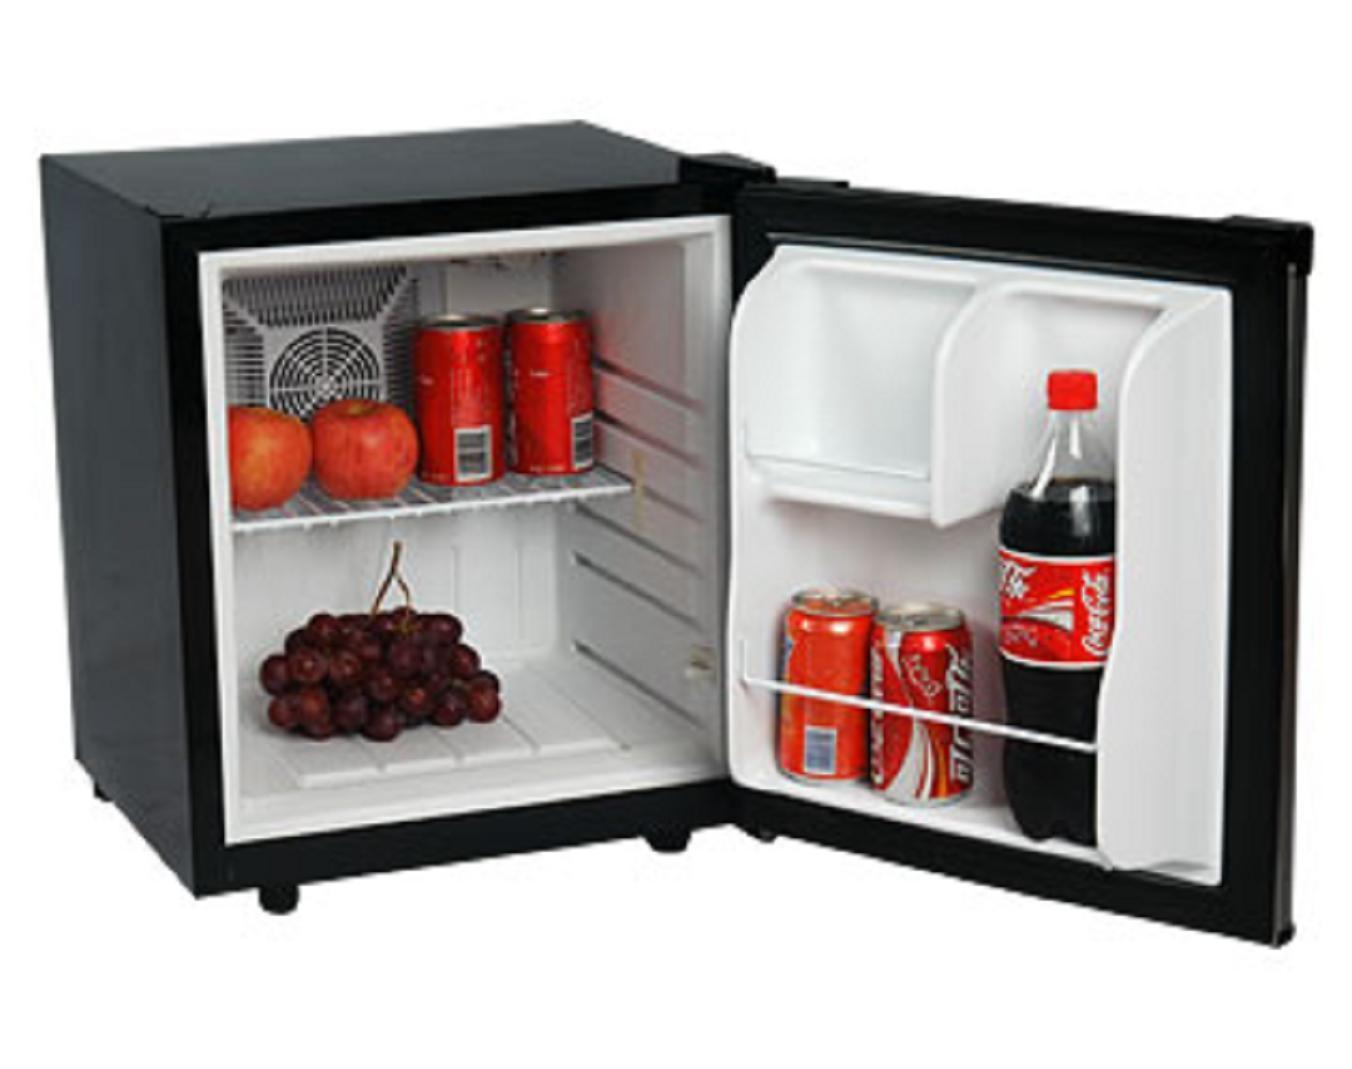 hight resolution of harga freezer cooler harga 11